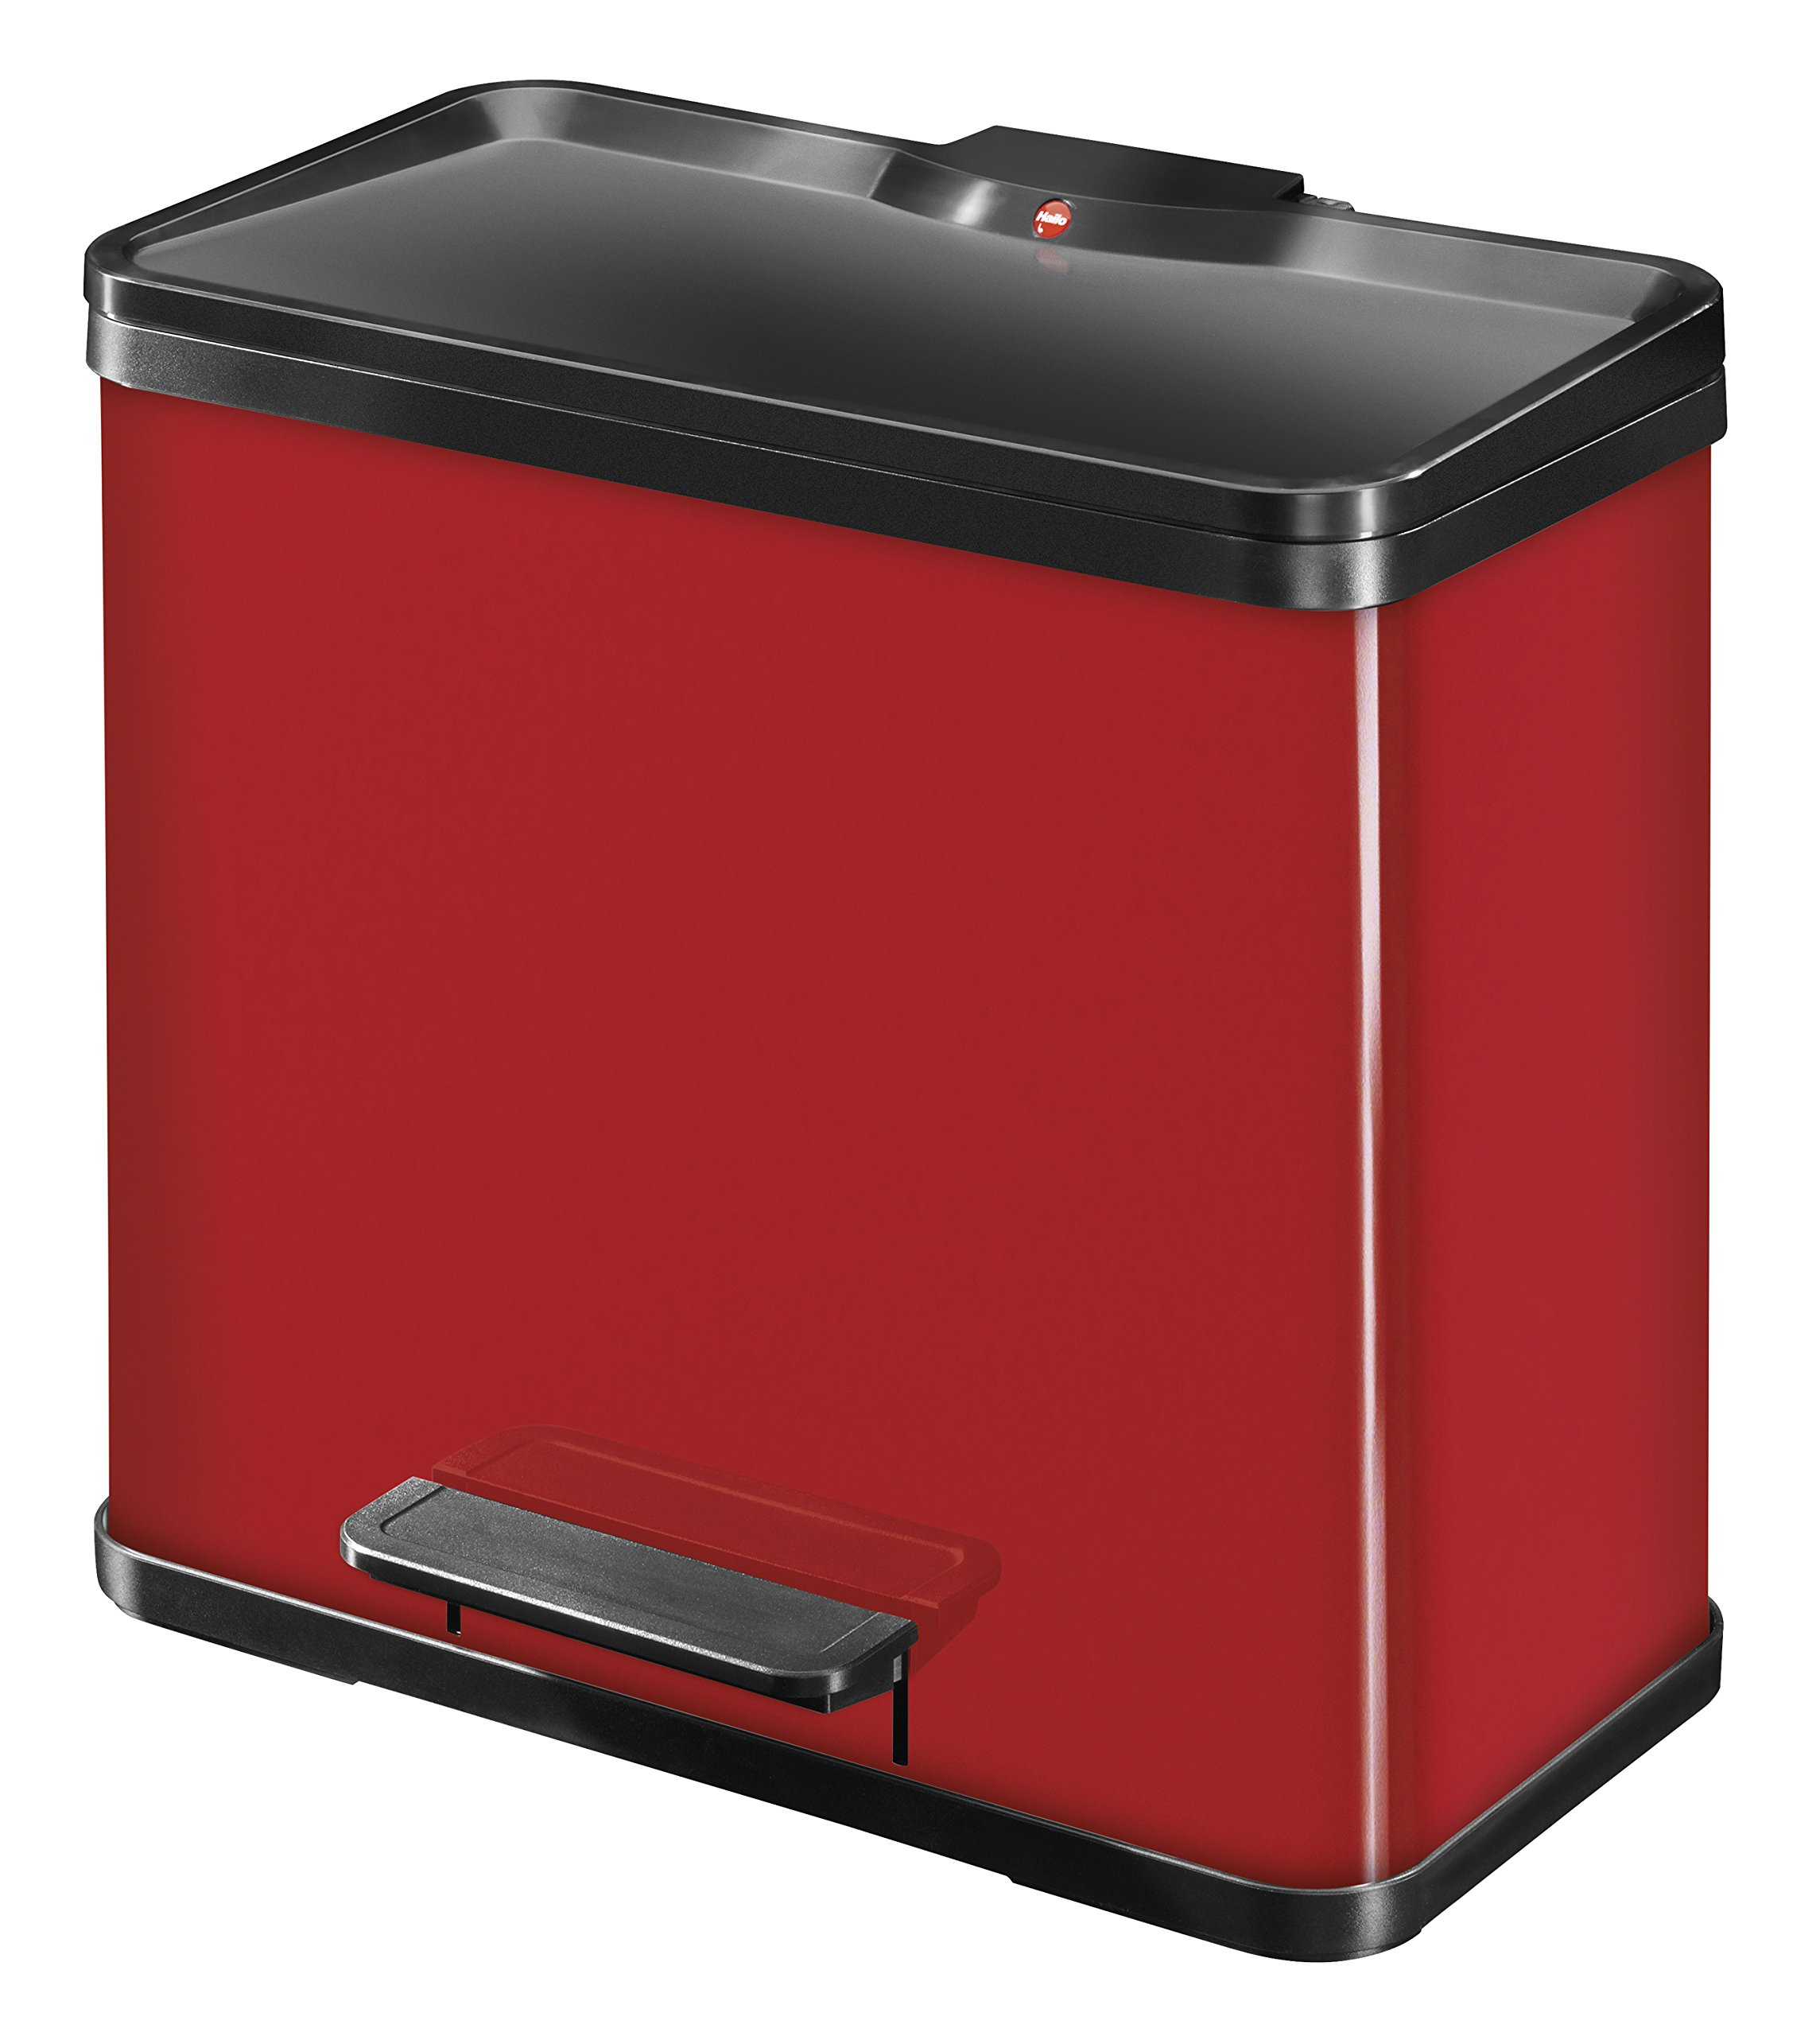 Hailo 0630-240''Oeko Duo Plus L Pedal Waste Separator, Sheet Steel Red, 17-9 Litre by Hailo